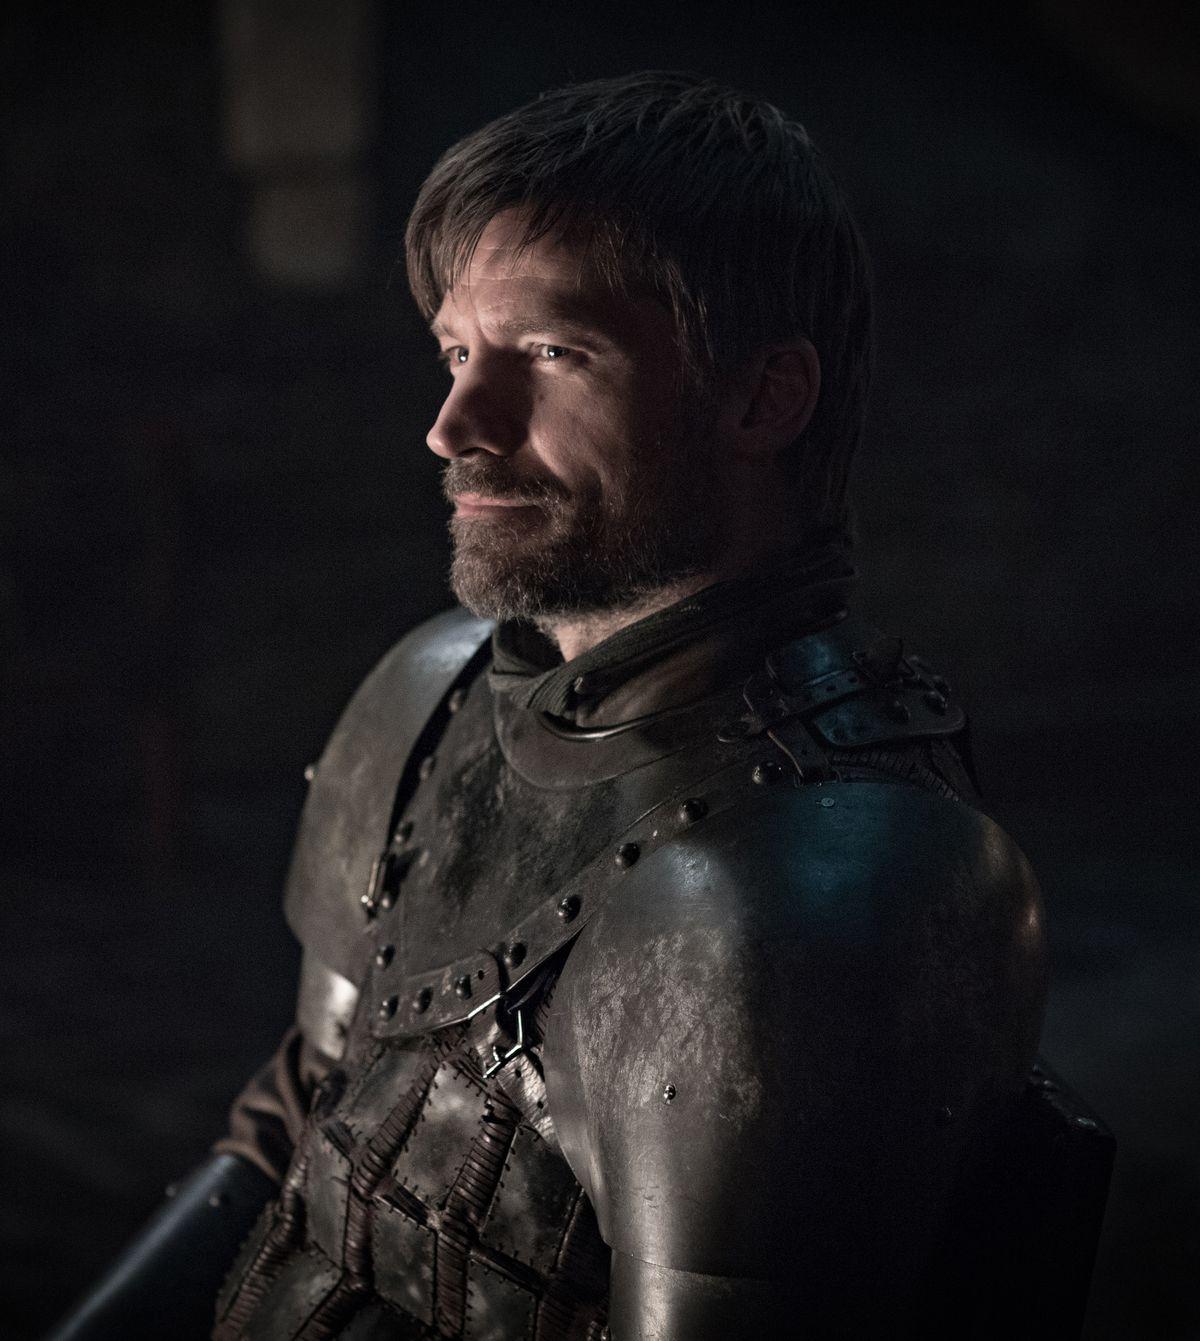 Game of Thrones season 8 - Jaime Lannister